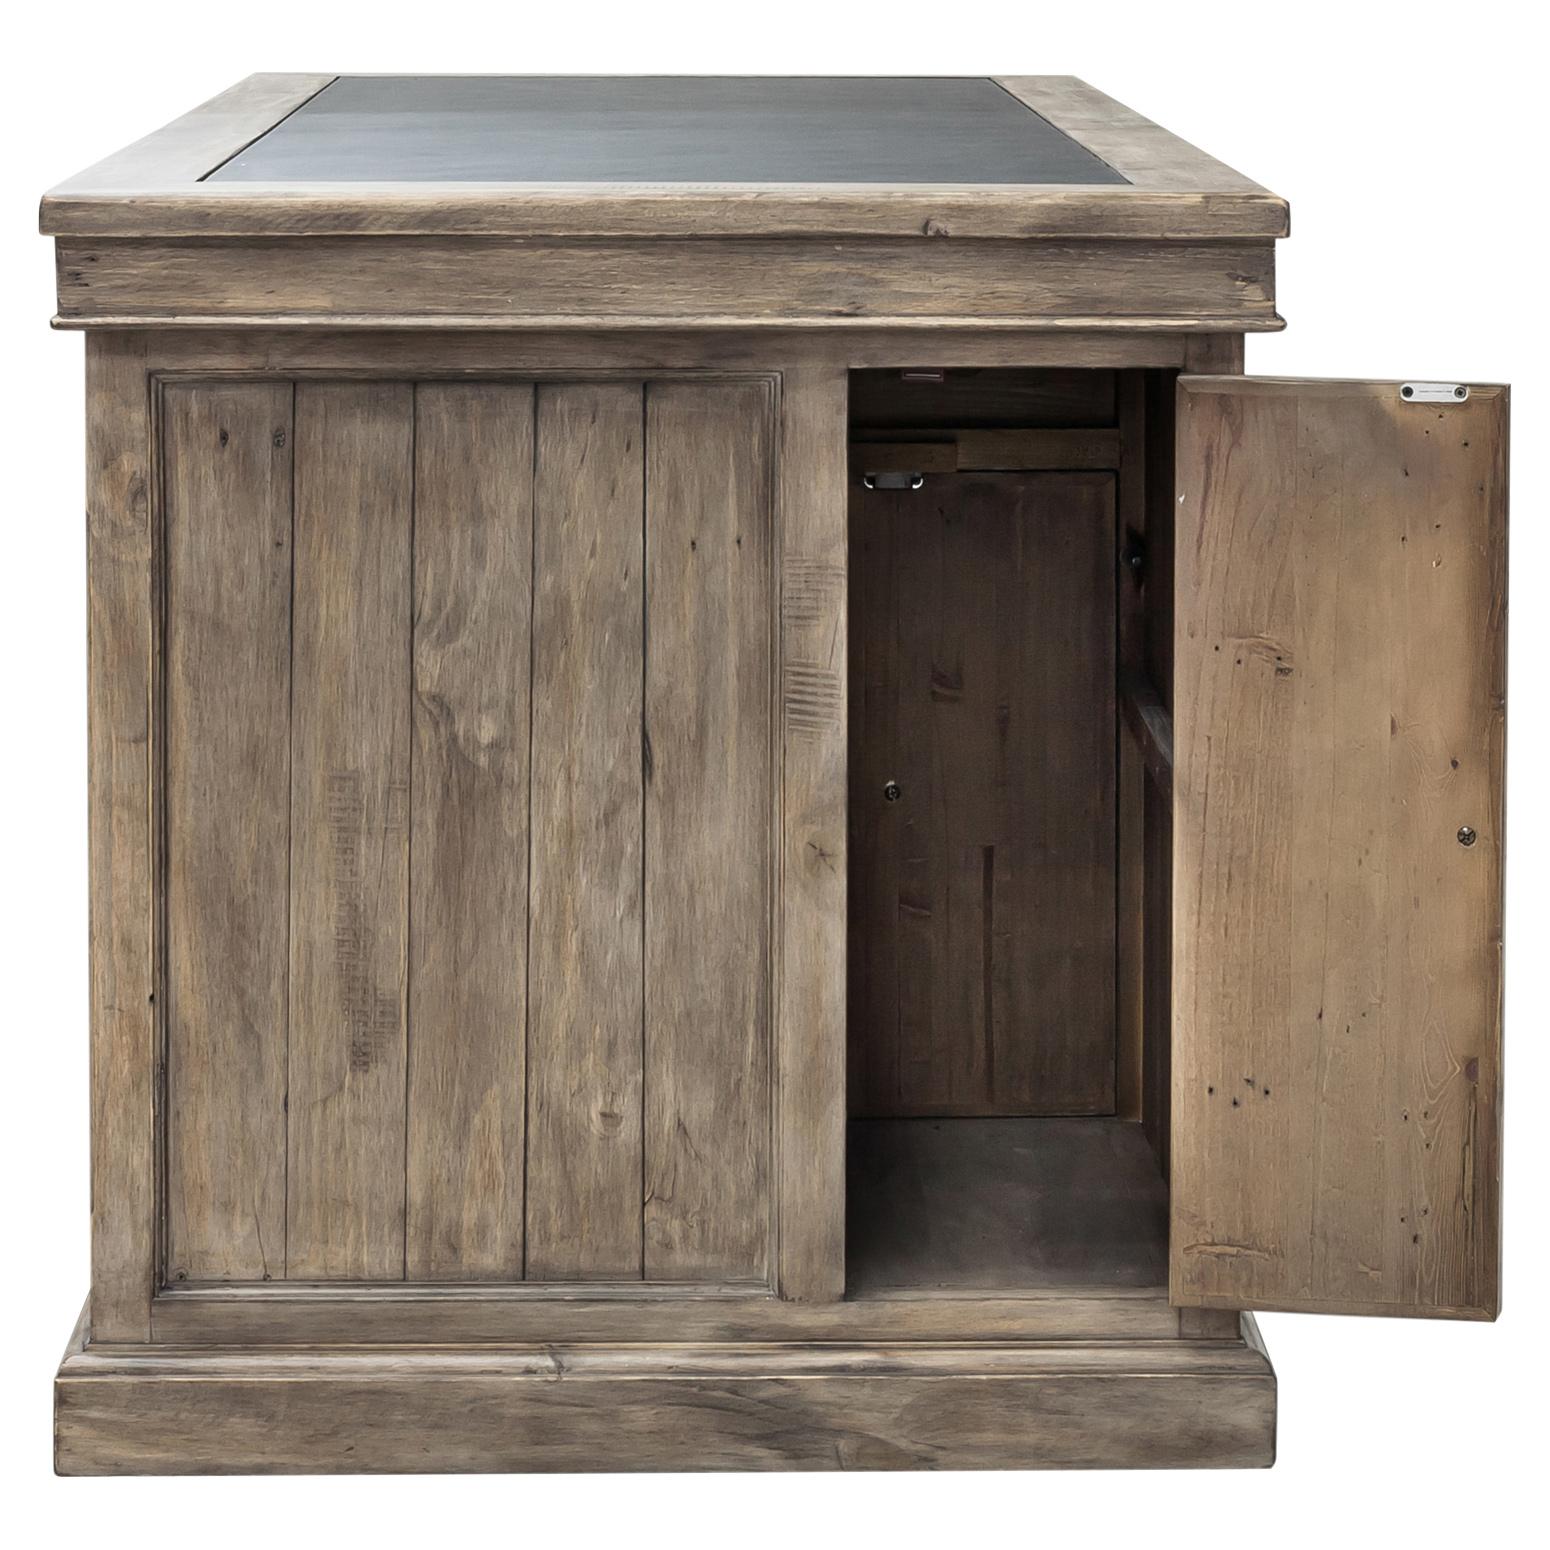 Ronin Rustic Lodge Warm Pine Wood Classic Desk